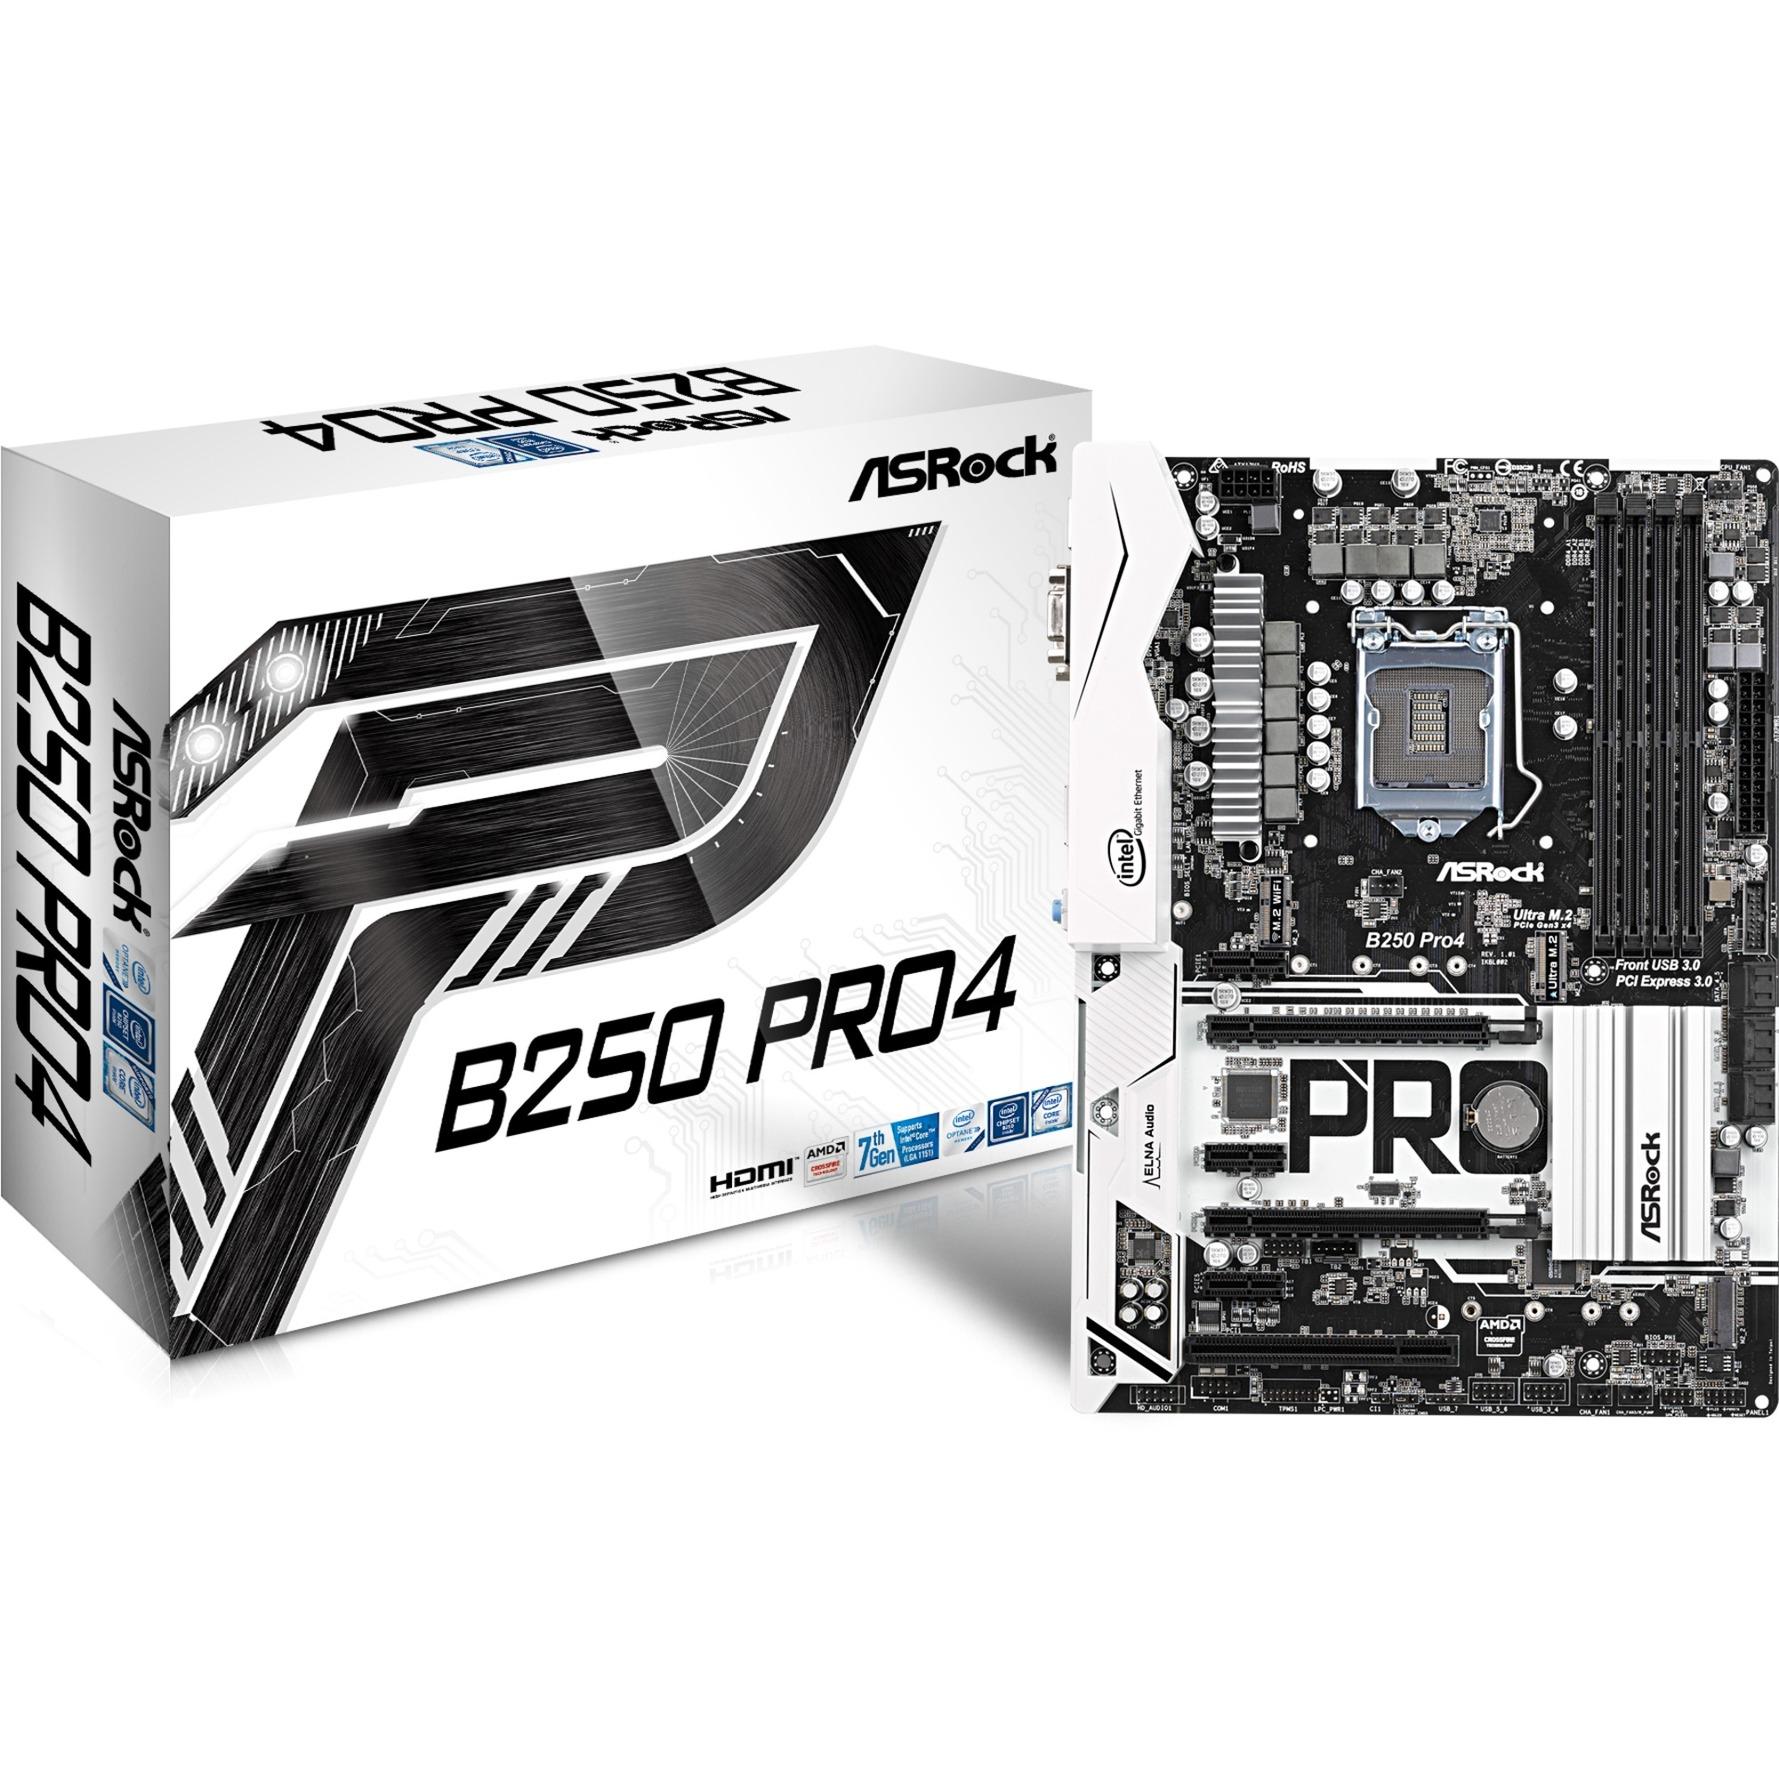 B250 Pro4 Intel B250 LGA 1151 (Zócalo H4) ATX, Placa base